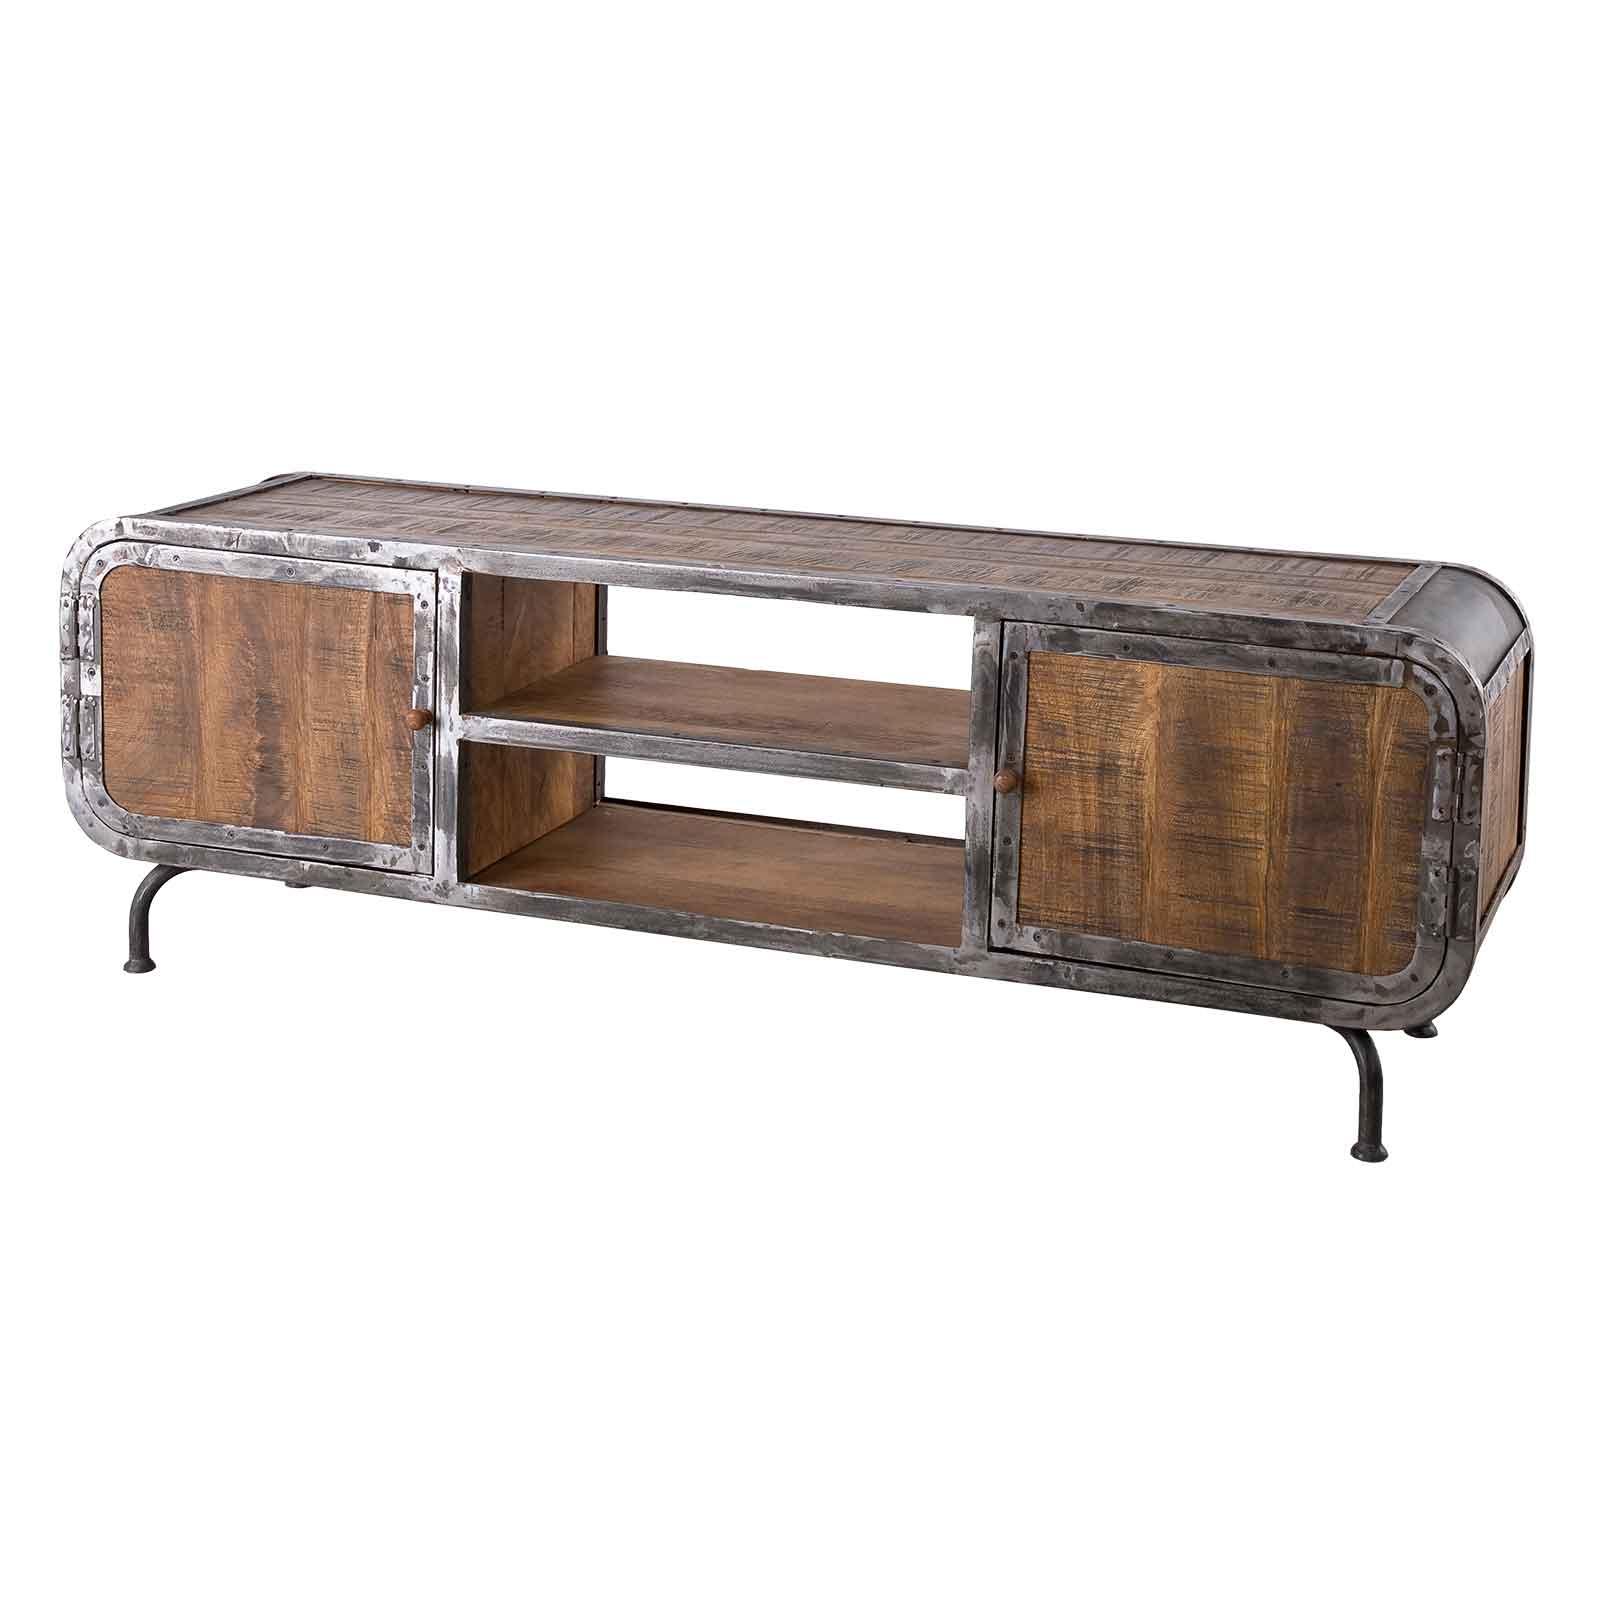 lowboard-saigon-aus-mangoholz-und-metall-180-x-60-cm